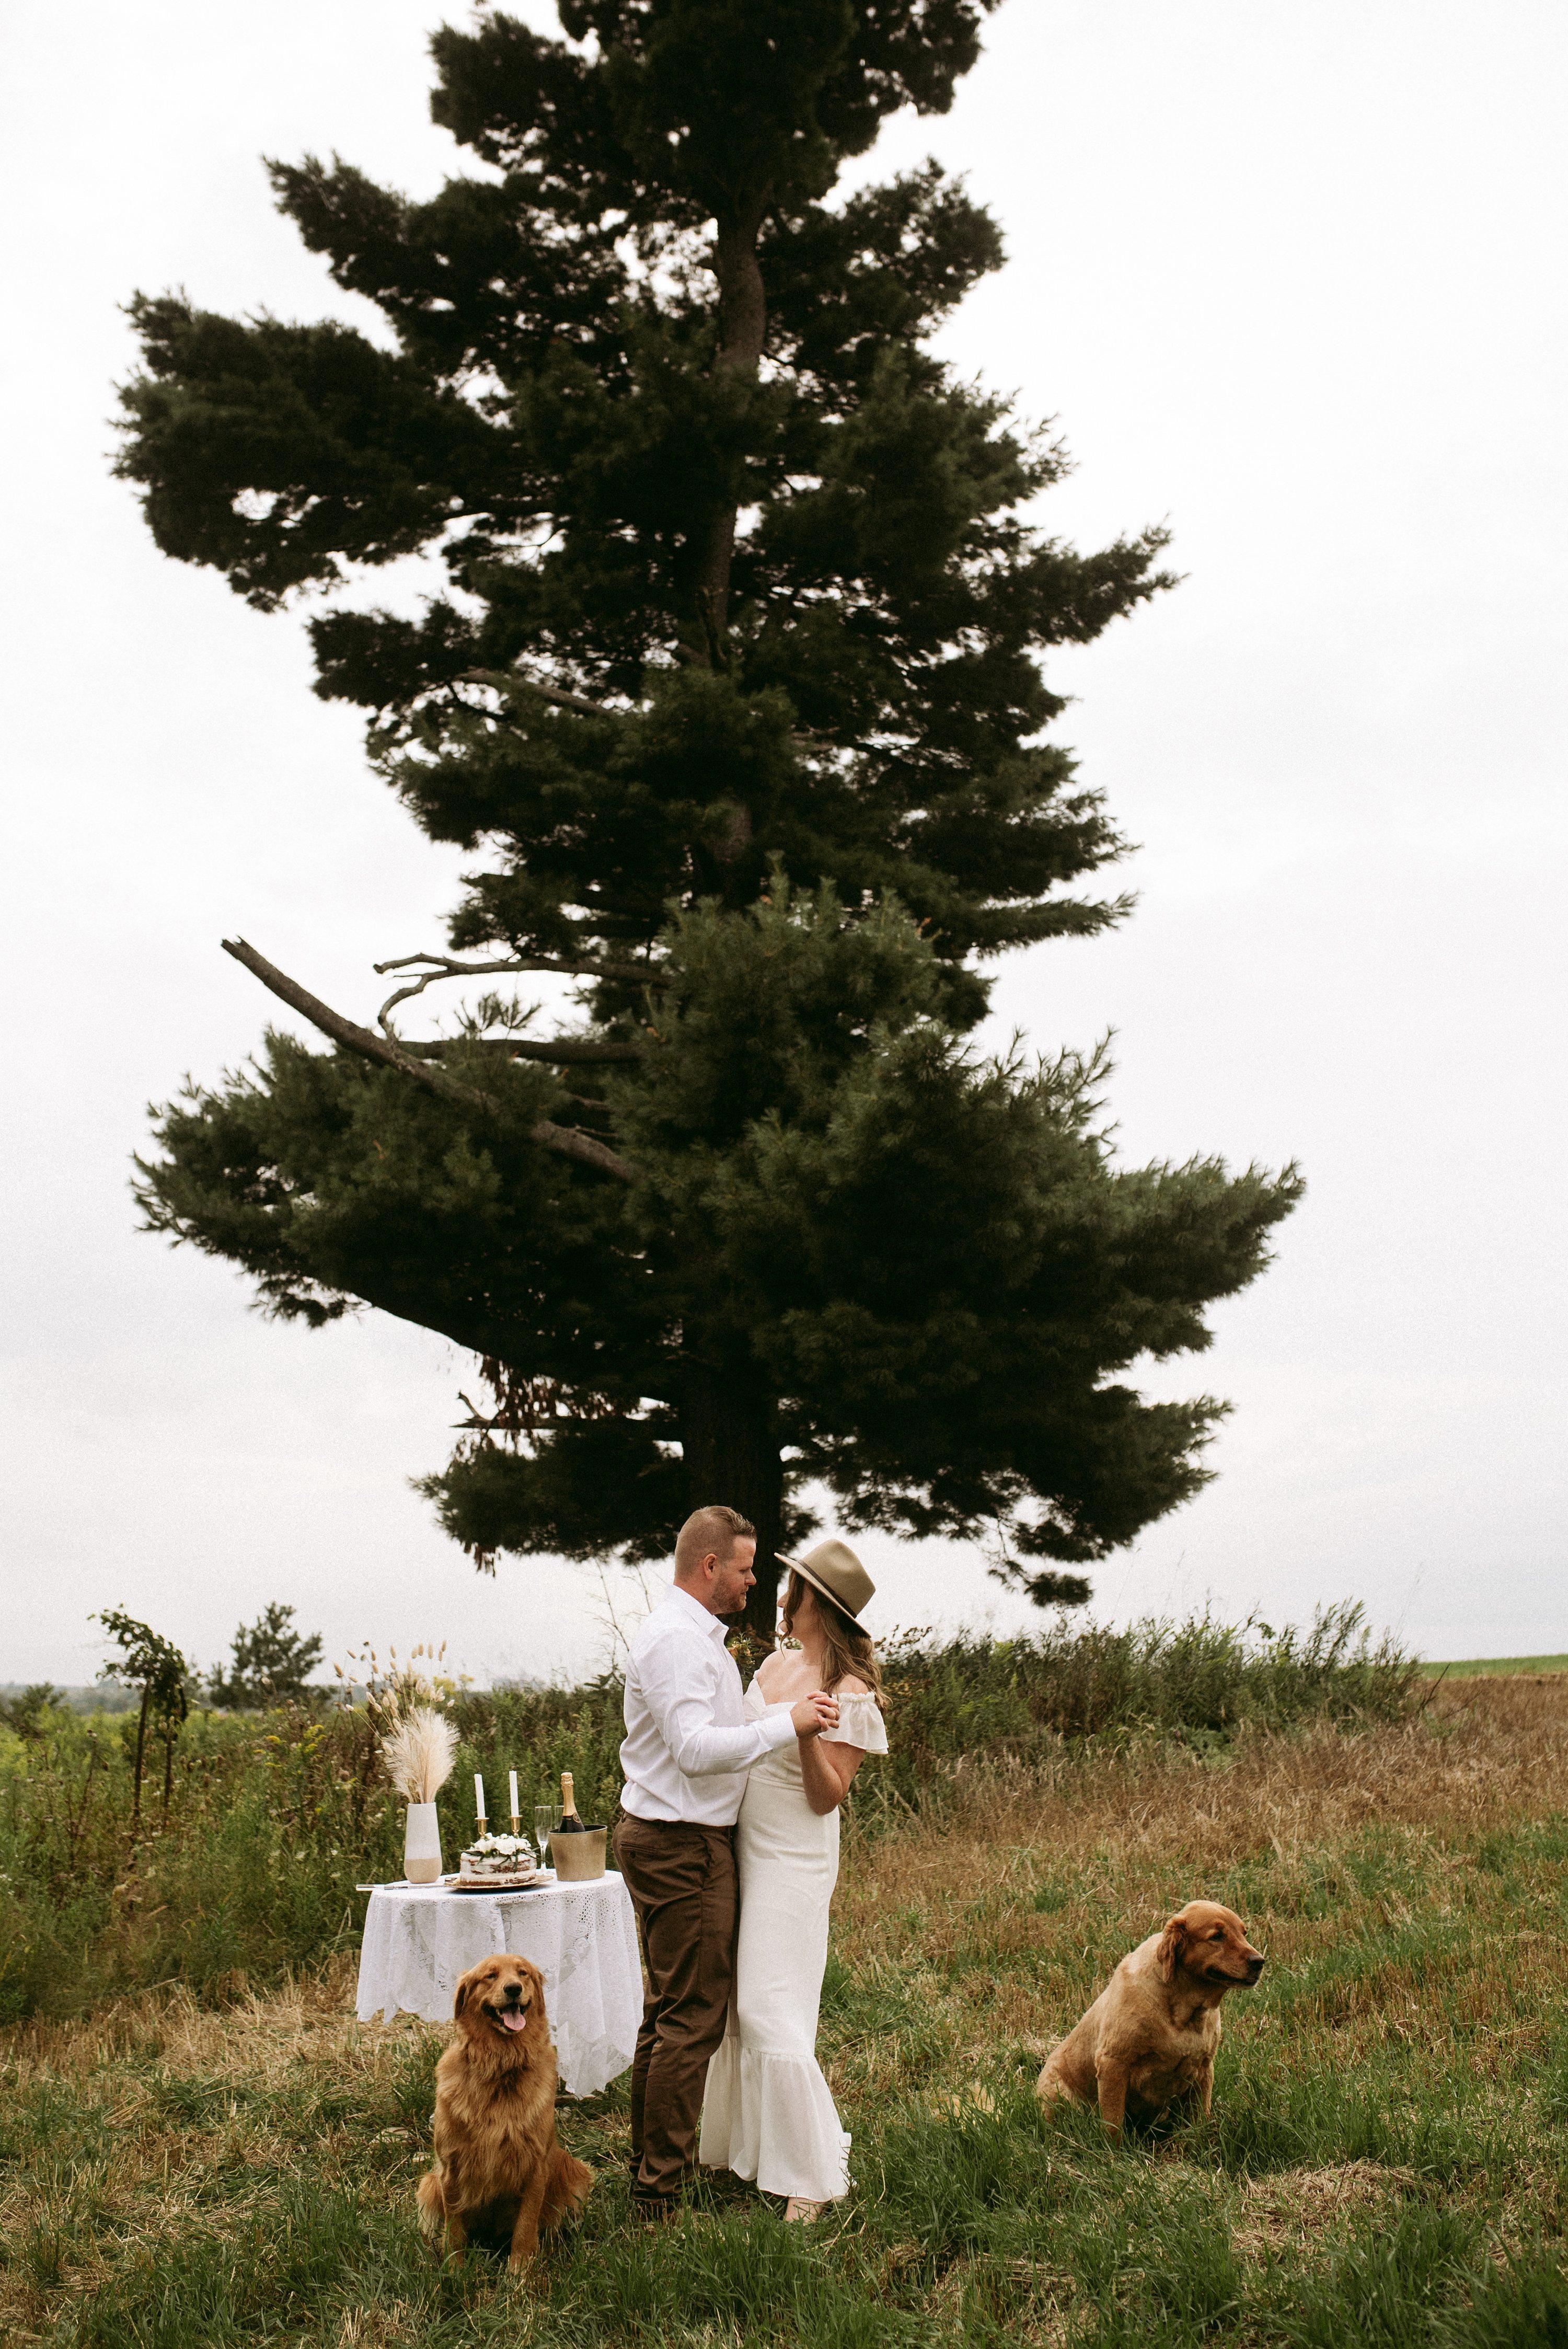 ontario elopement,simple wedding